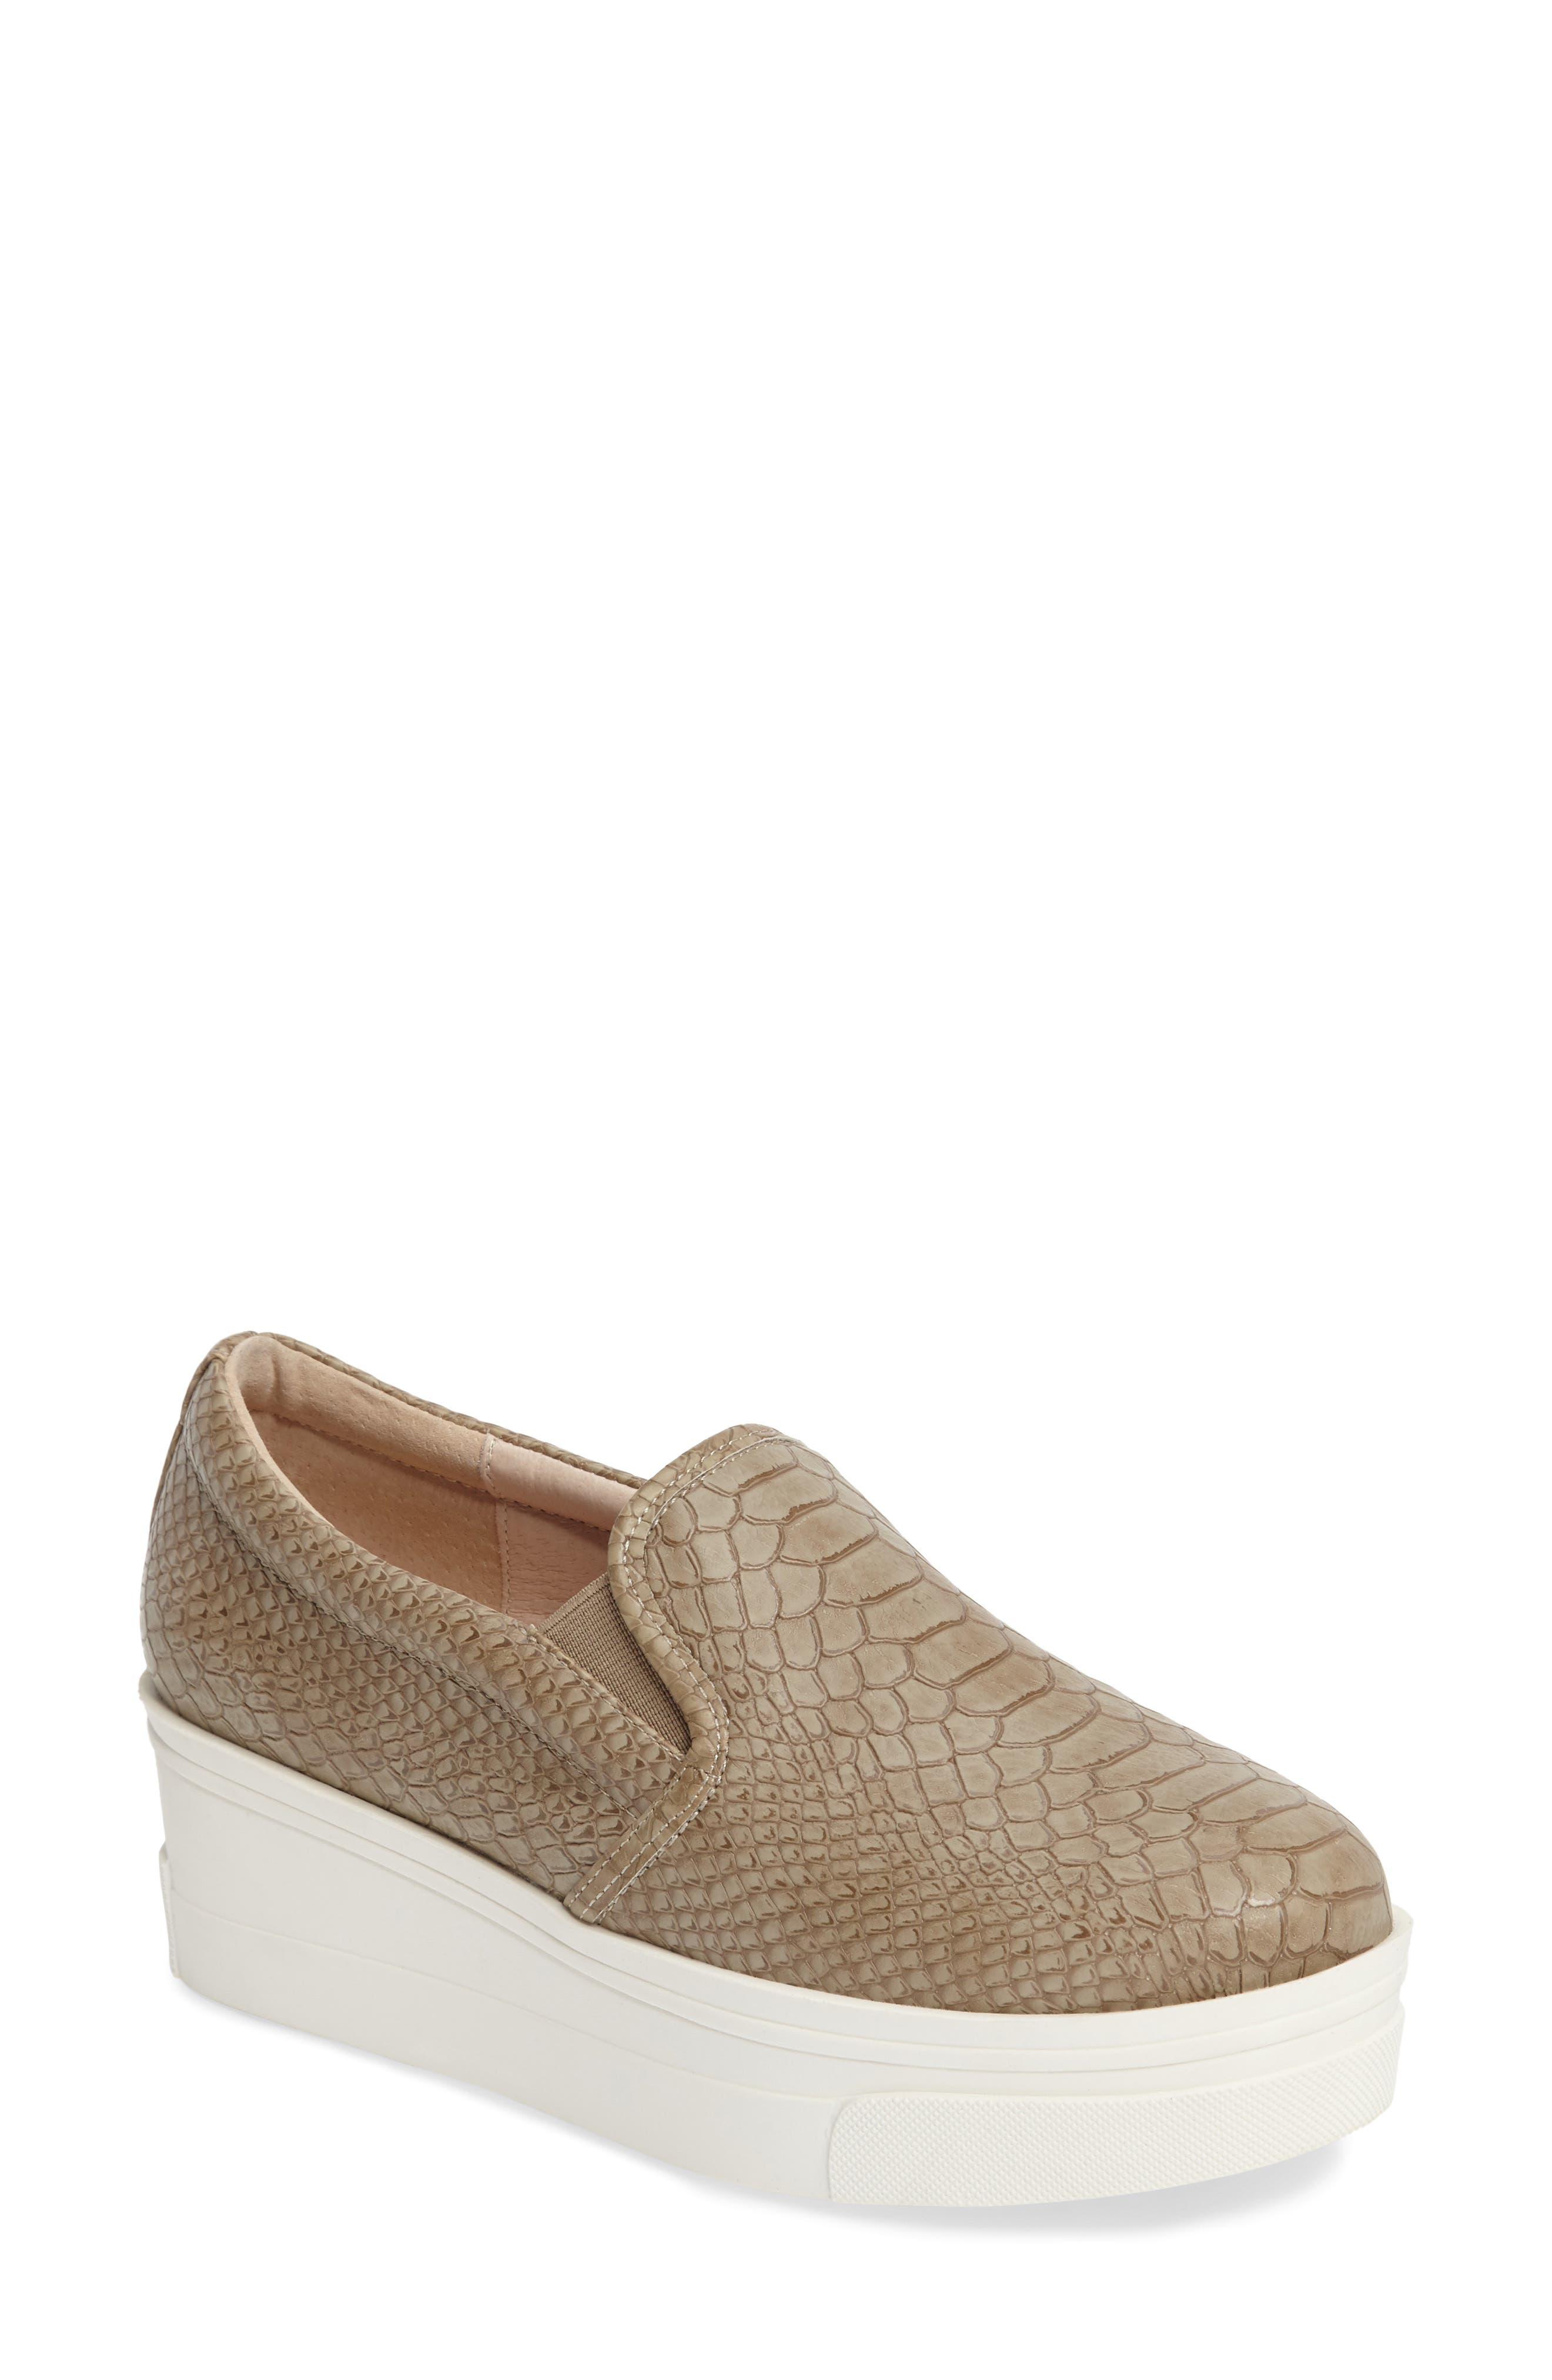 Main Image - JSlides Genna Slip-On Sneaker (Women)